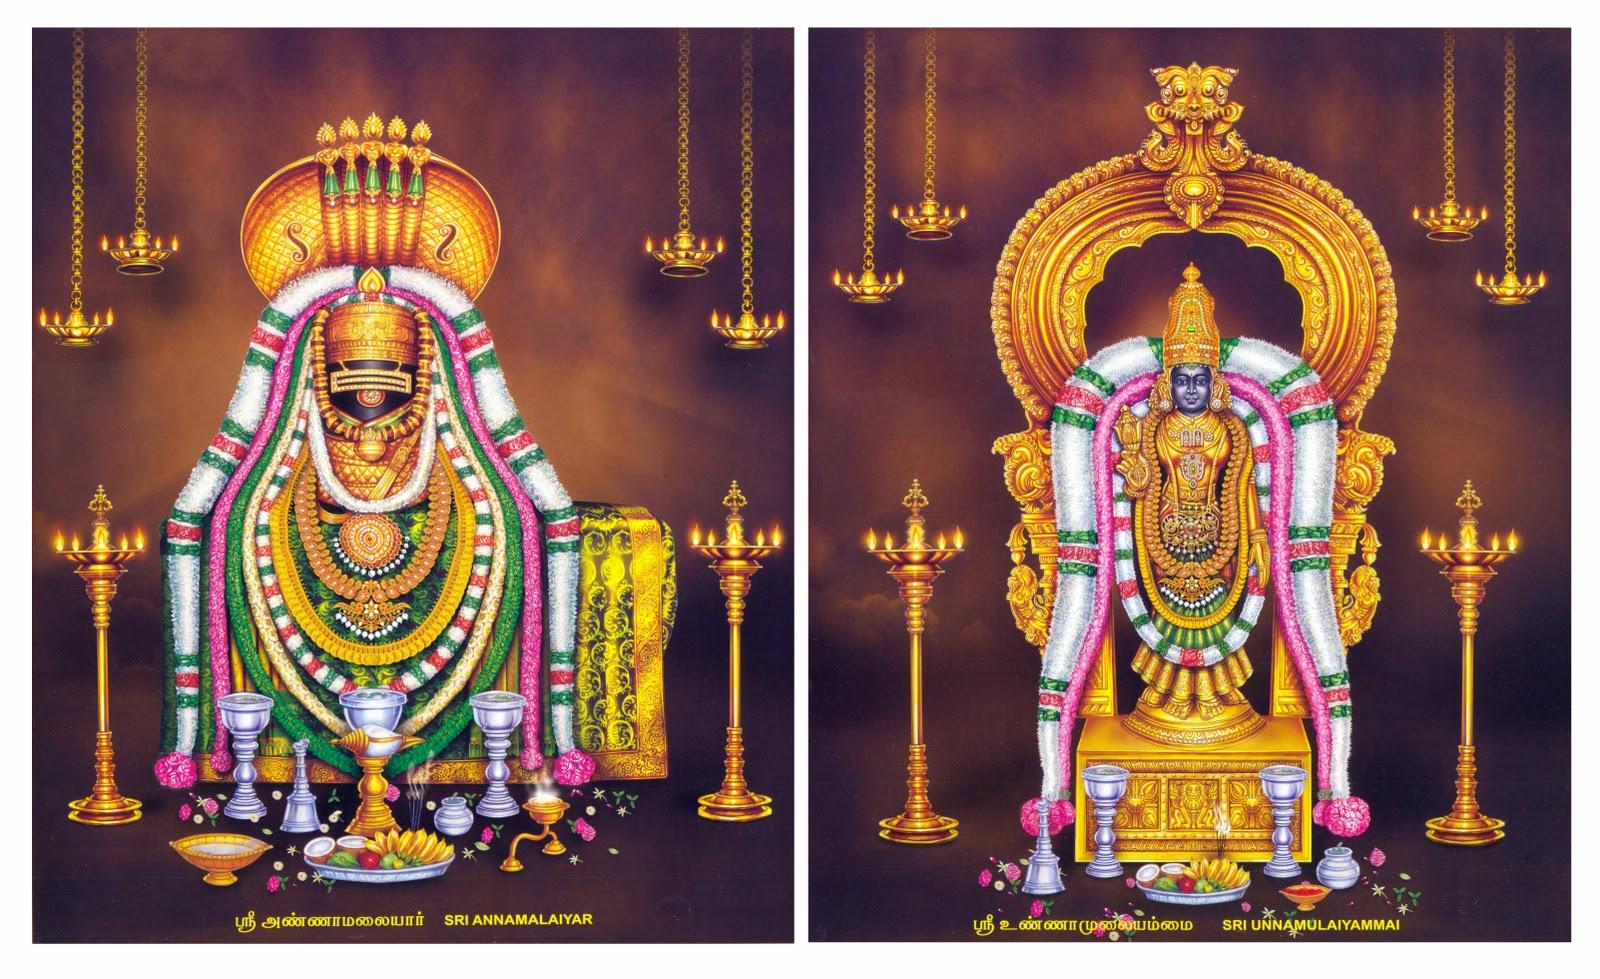 LORD SIVA: Annamalai Images